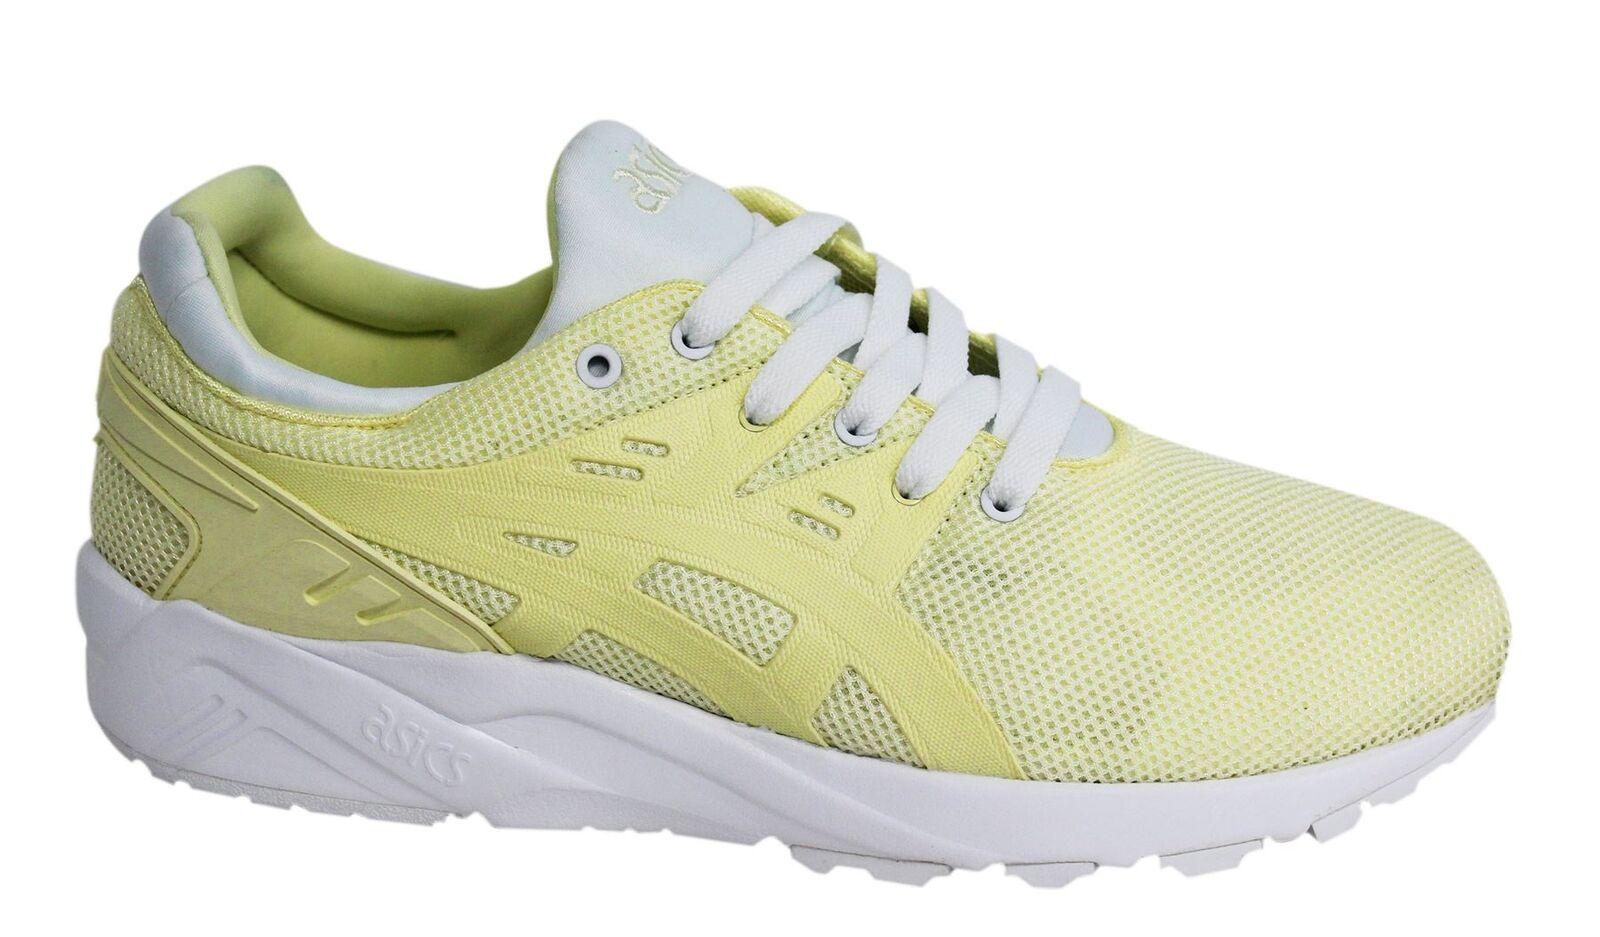 Asics Gel-Kayano con Lacci amarillo Tessuto da mujer mujer mujer zapatos Ginnastica Hn6b5 9898 7eb0e5